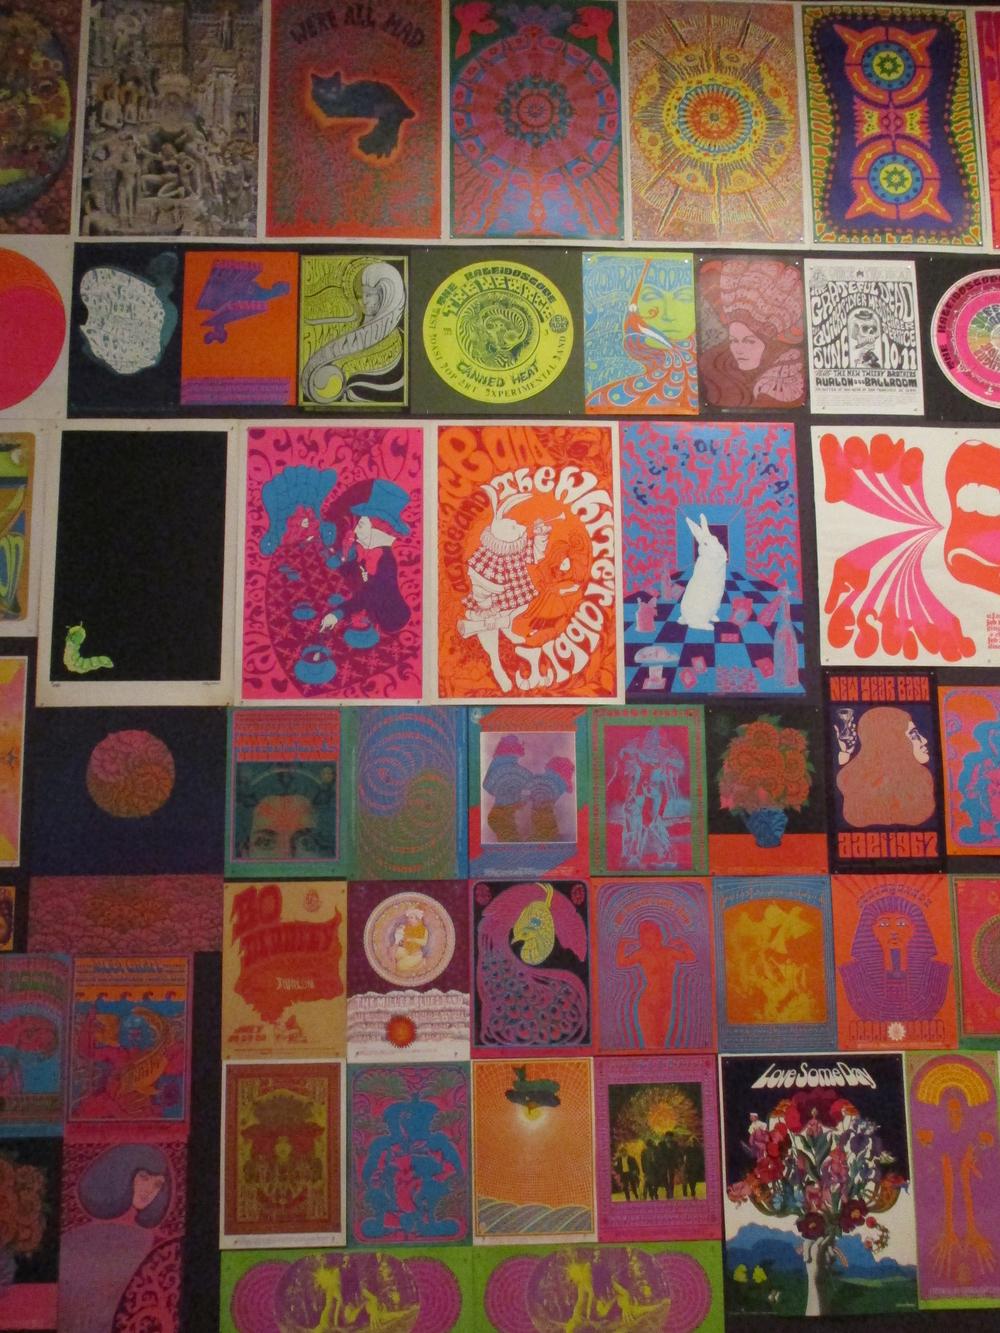 Peace and Love at MoMA